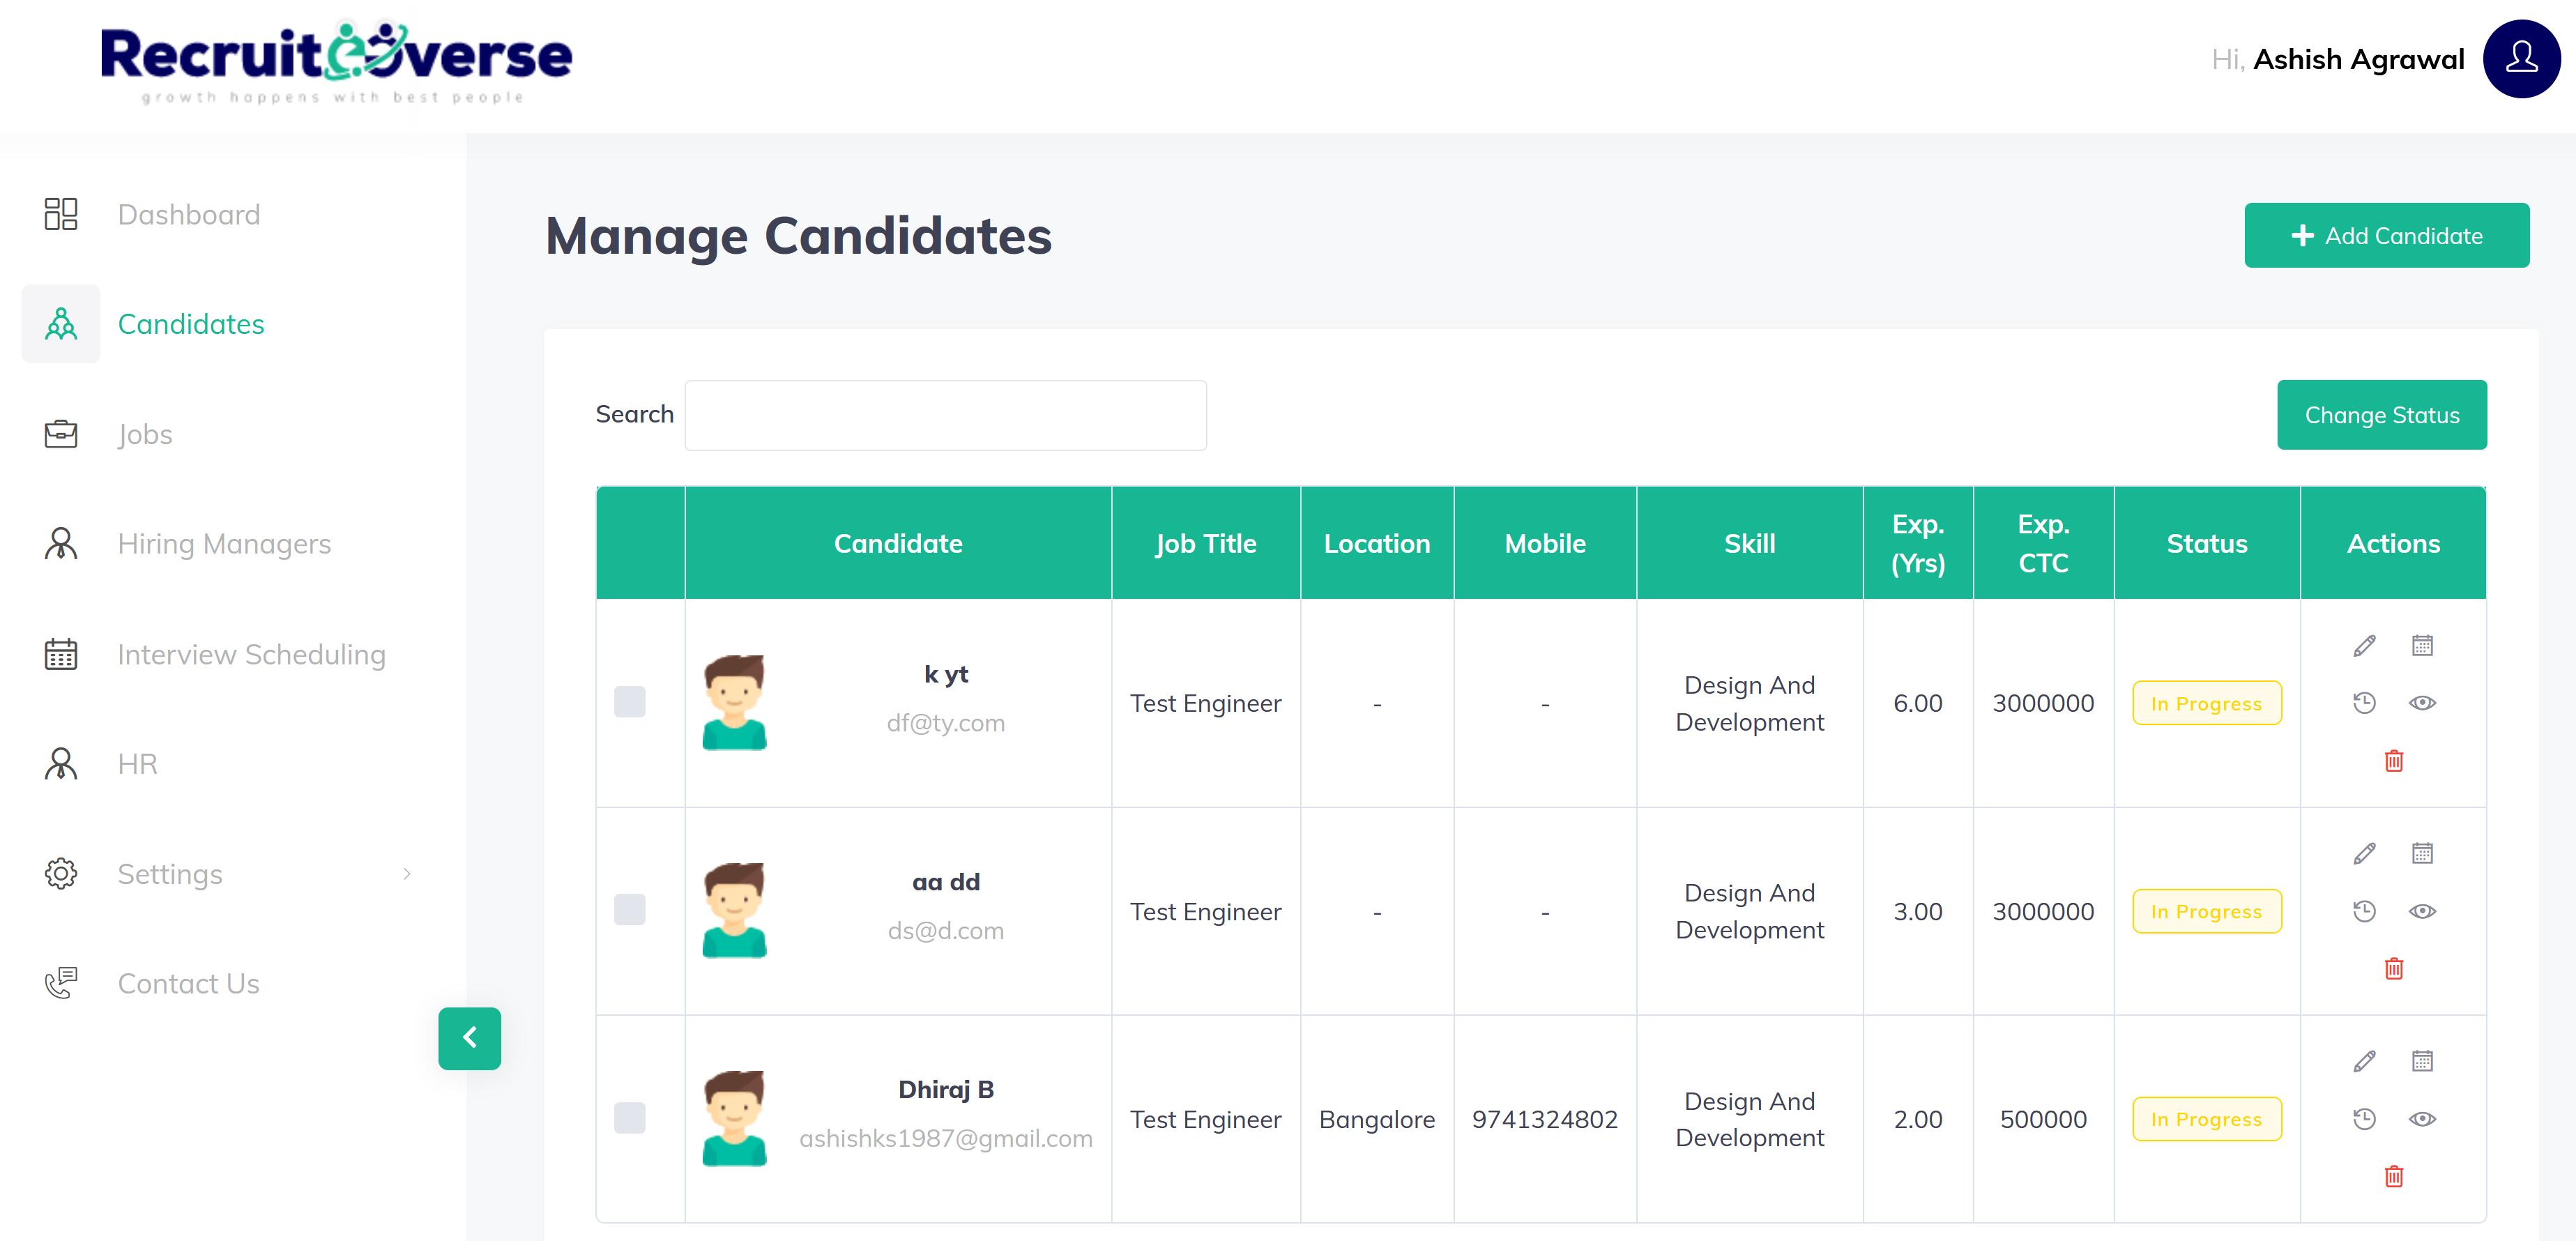 Recruiteeverse manage candidates